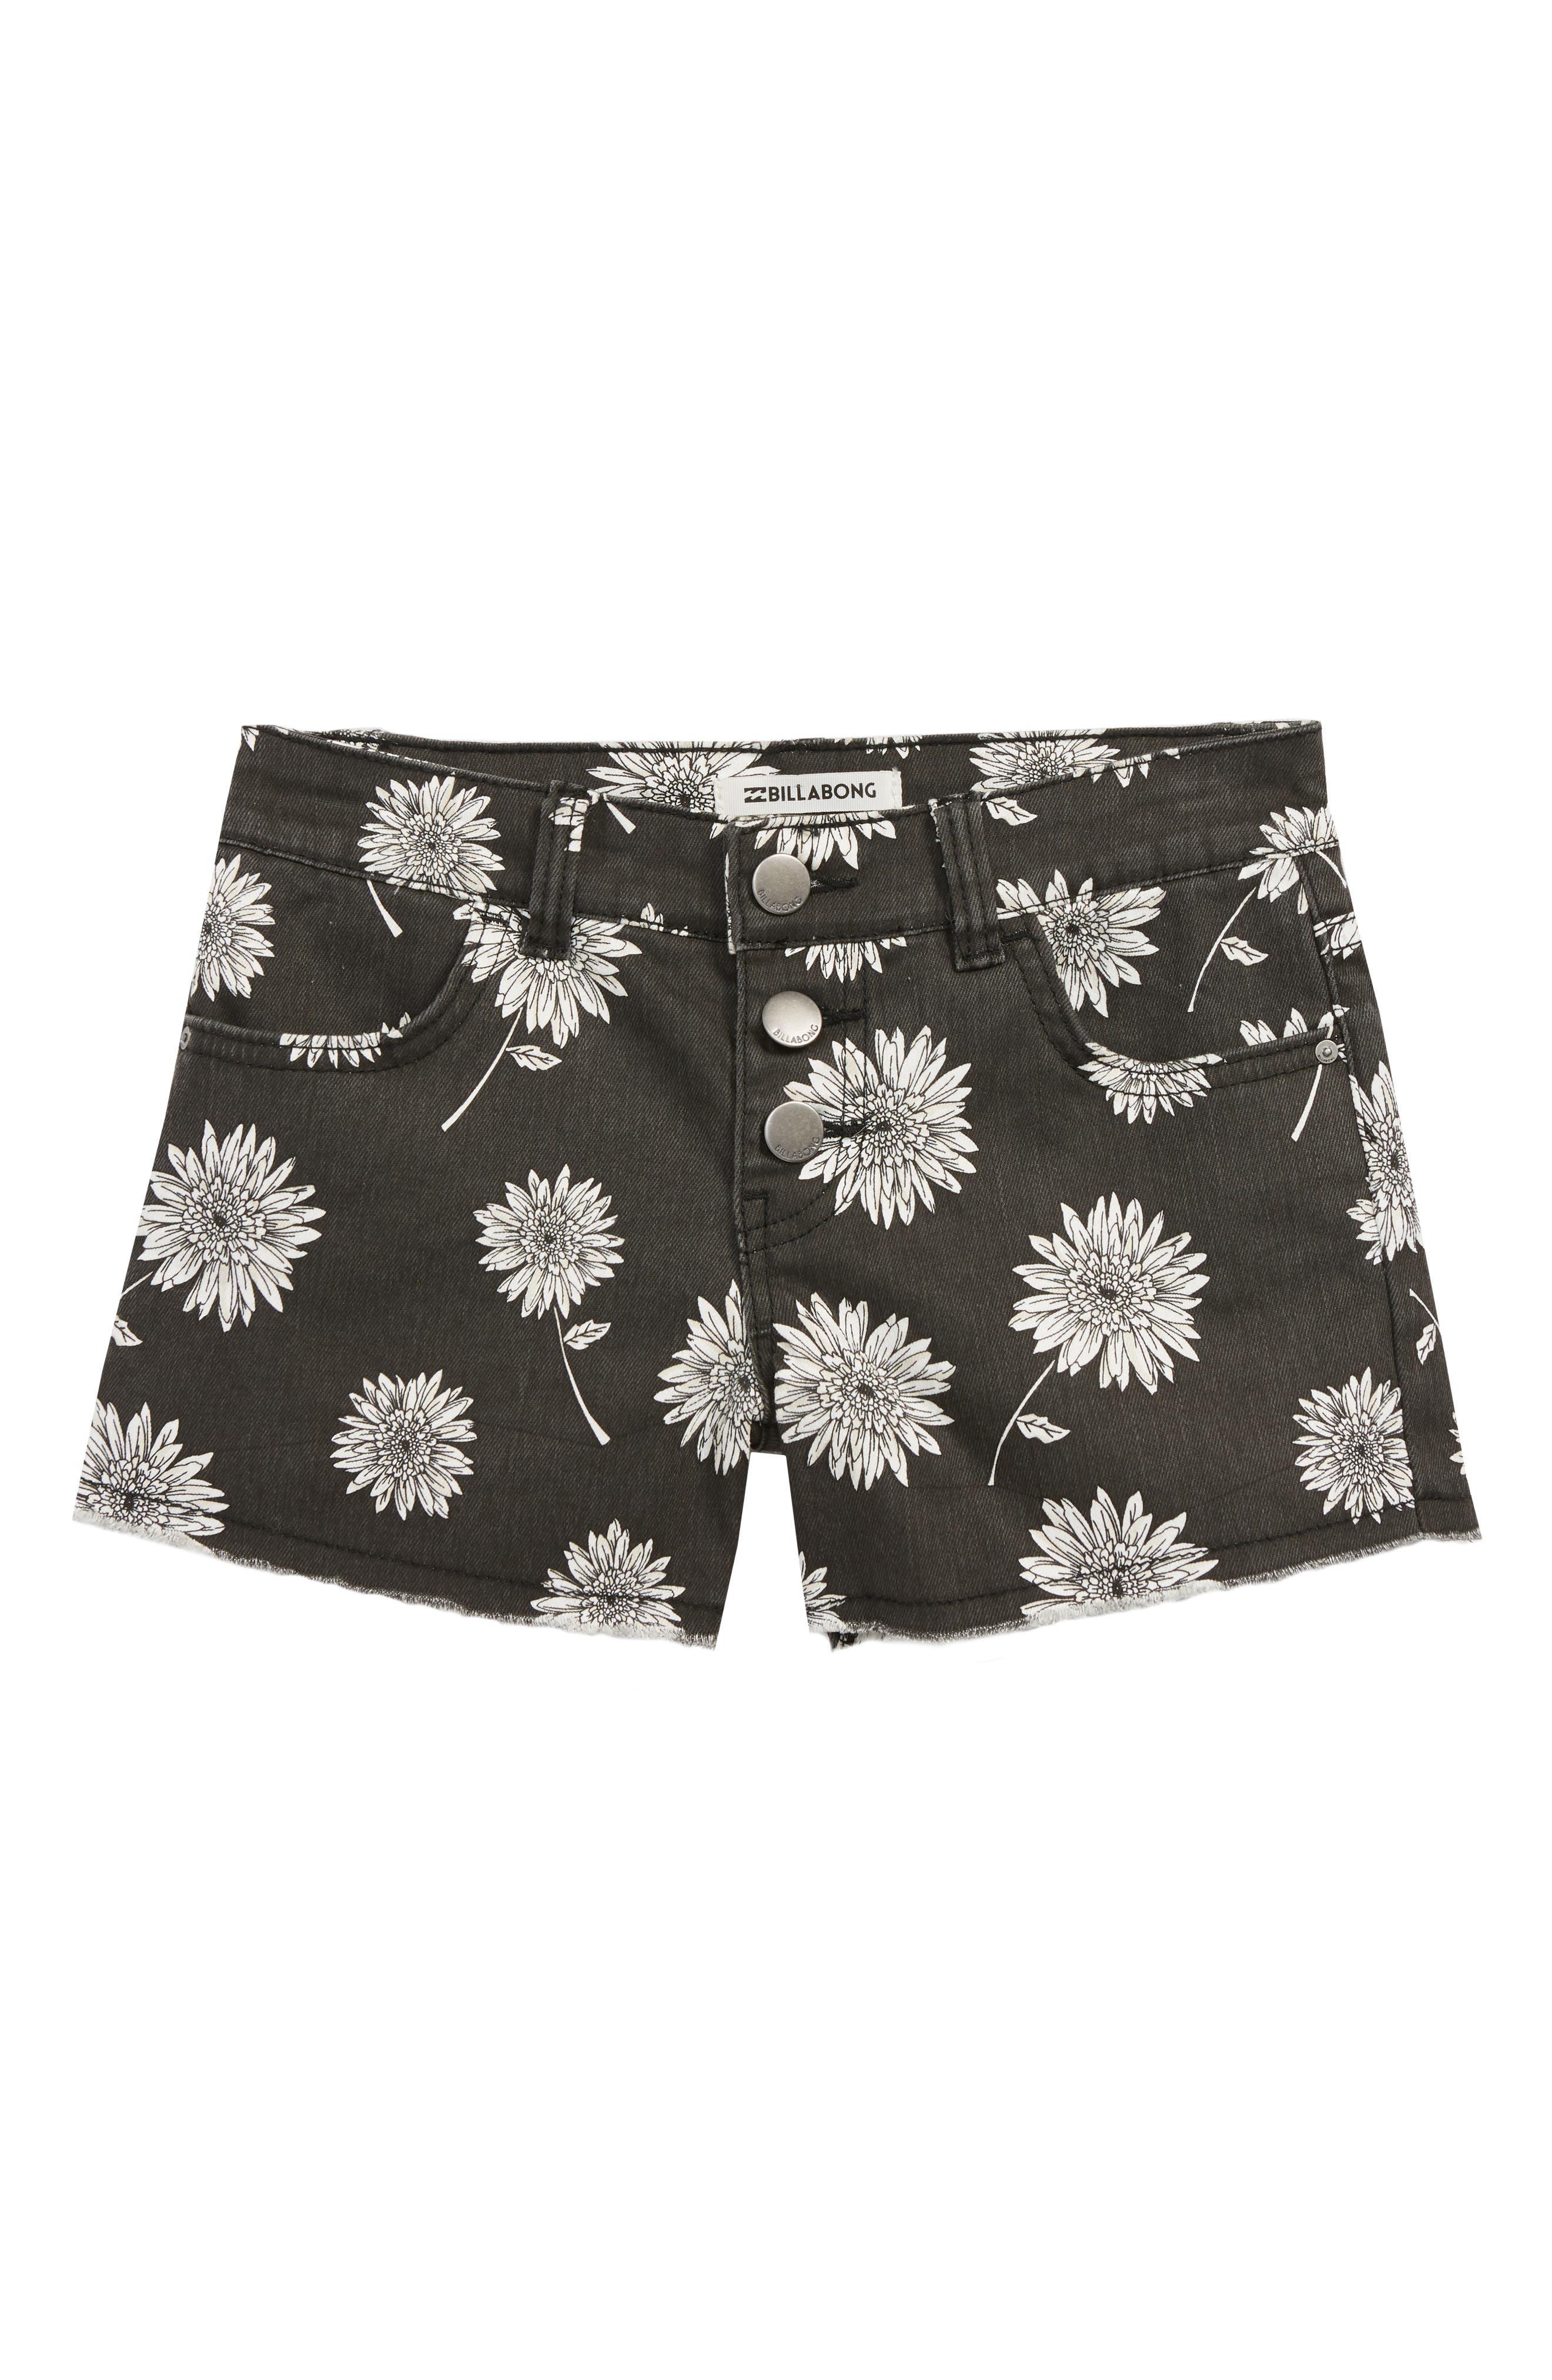 Buttoned Up Denim Shorts,                             Main thumbnail 1, color,                             001